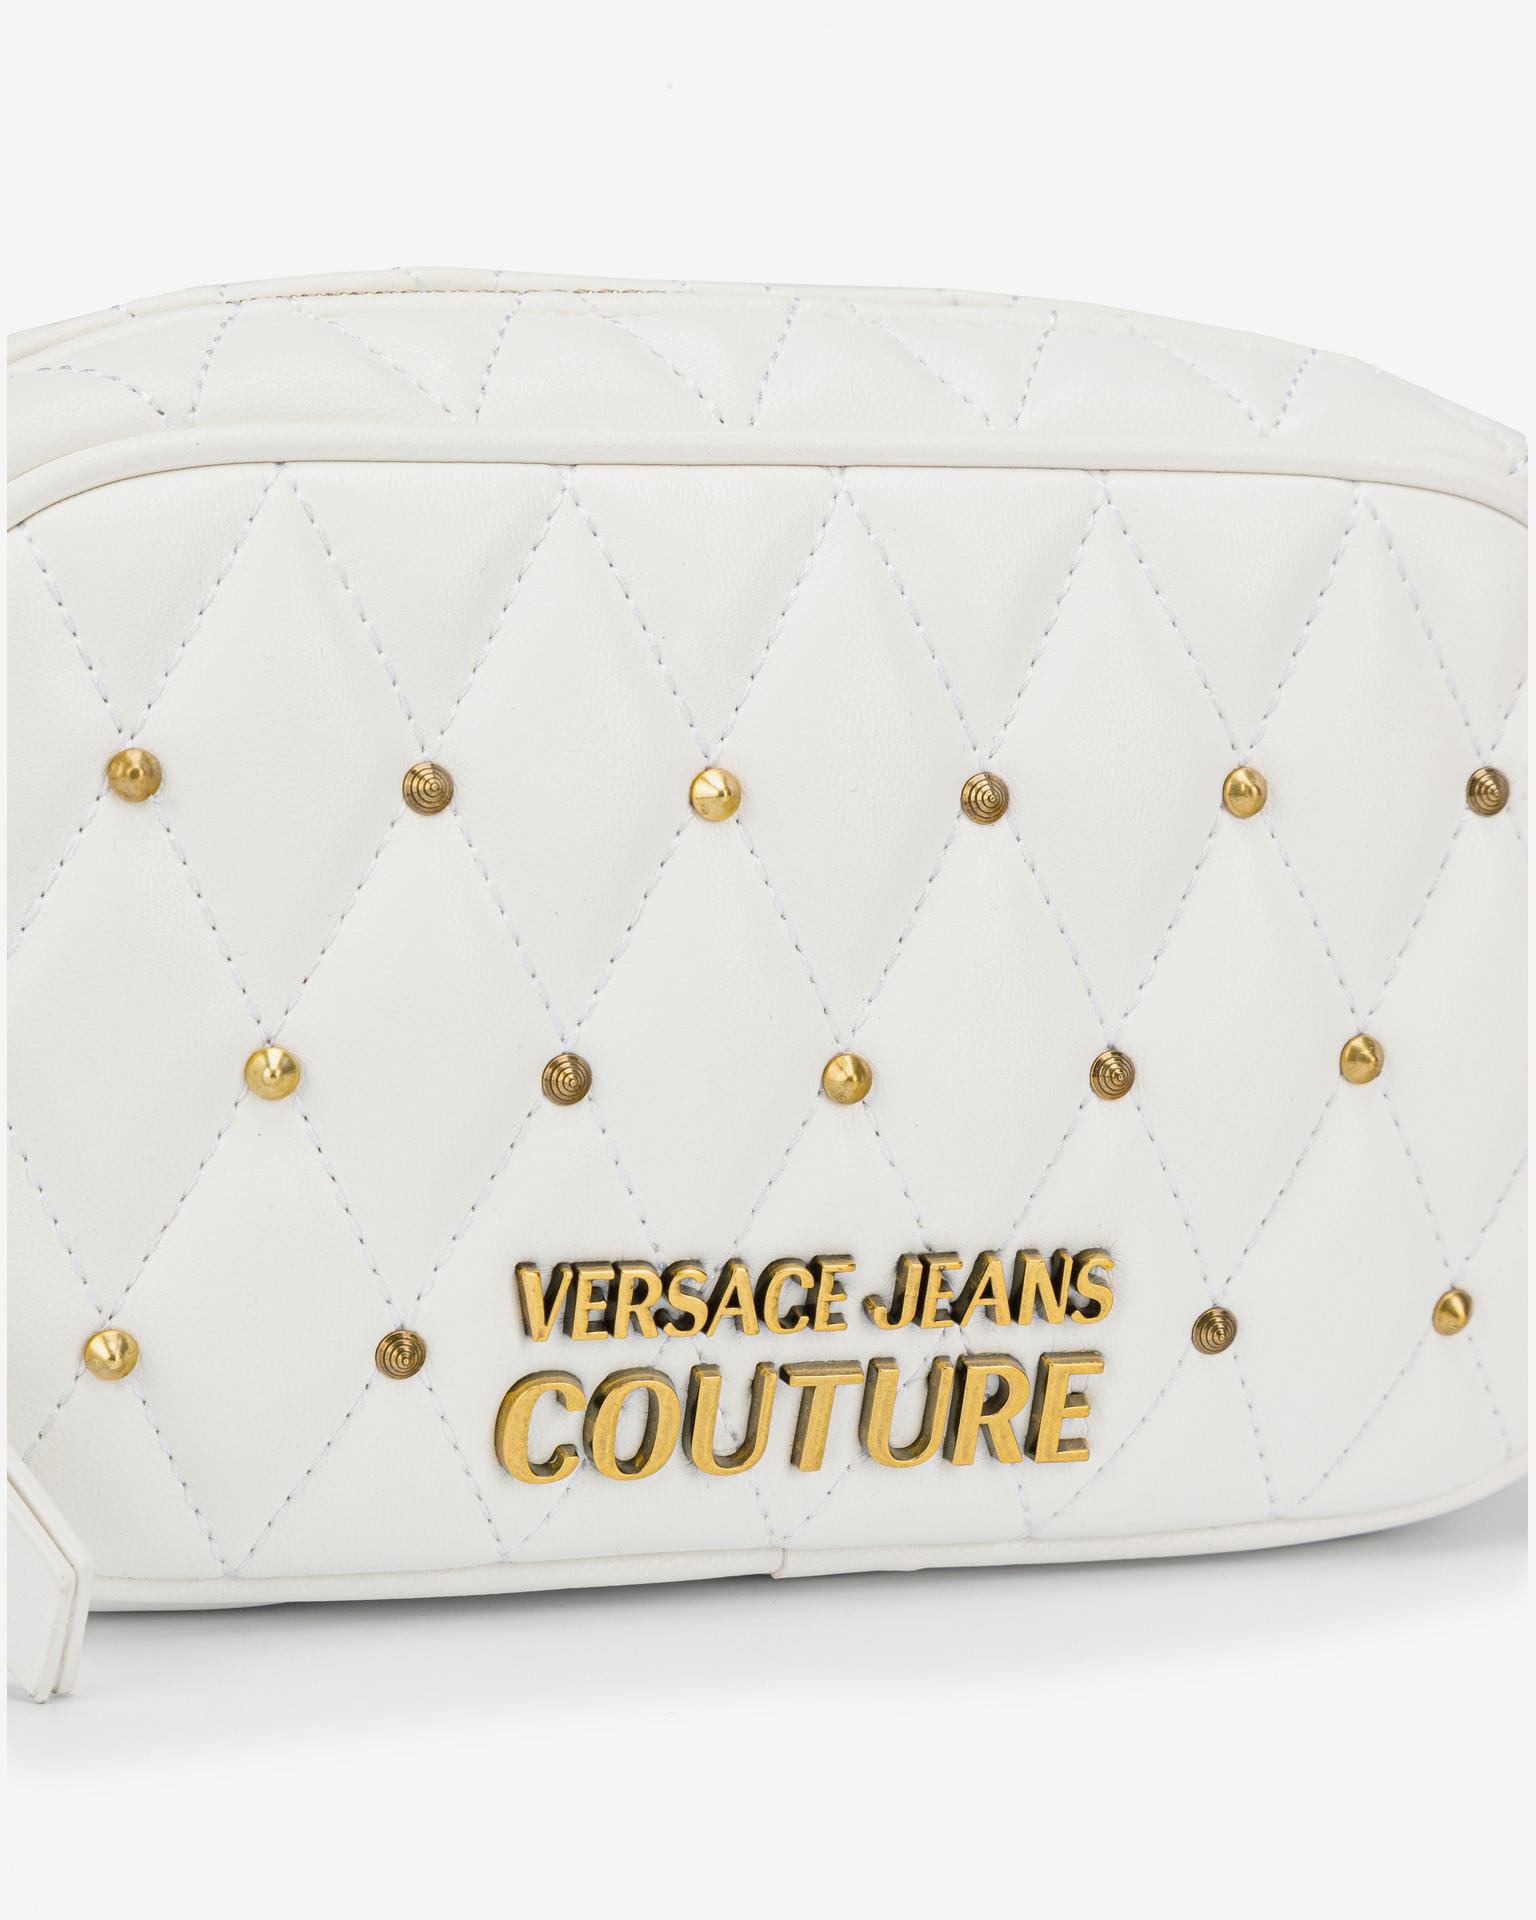 Versace Jeans Couture biały torebka